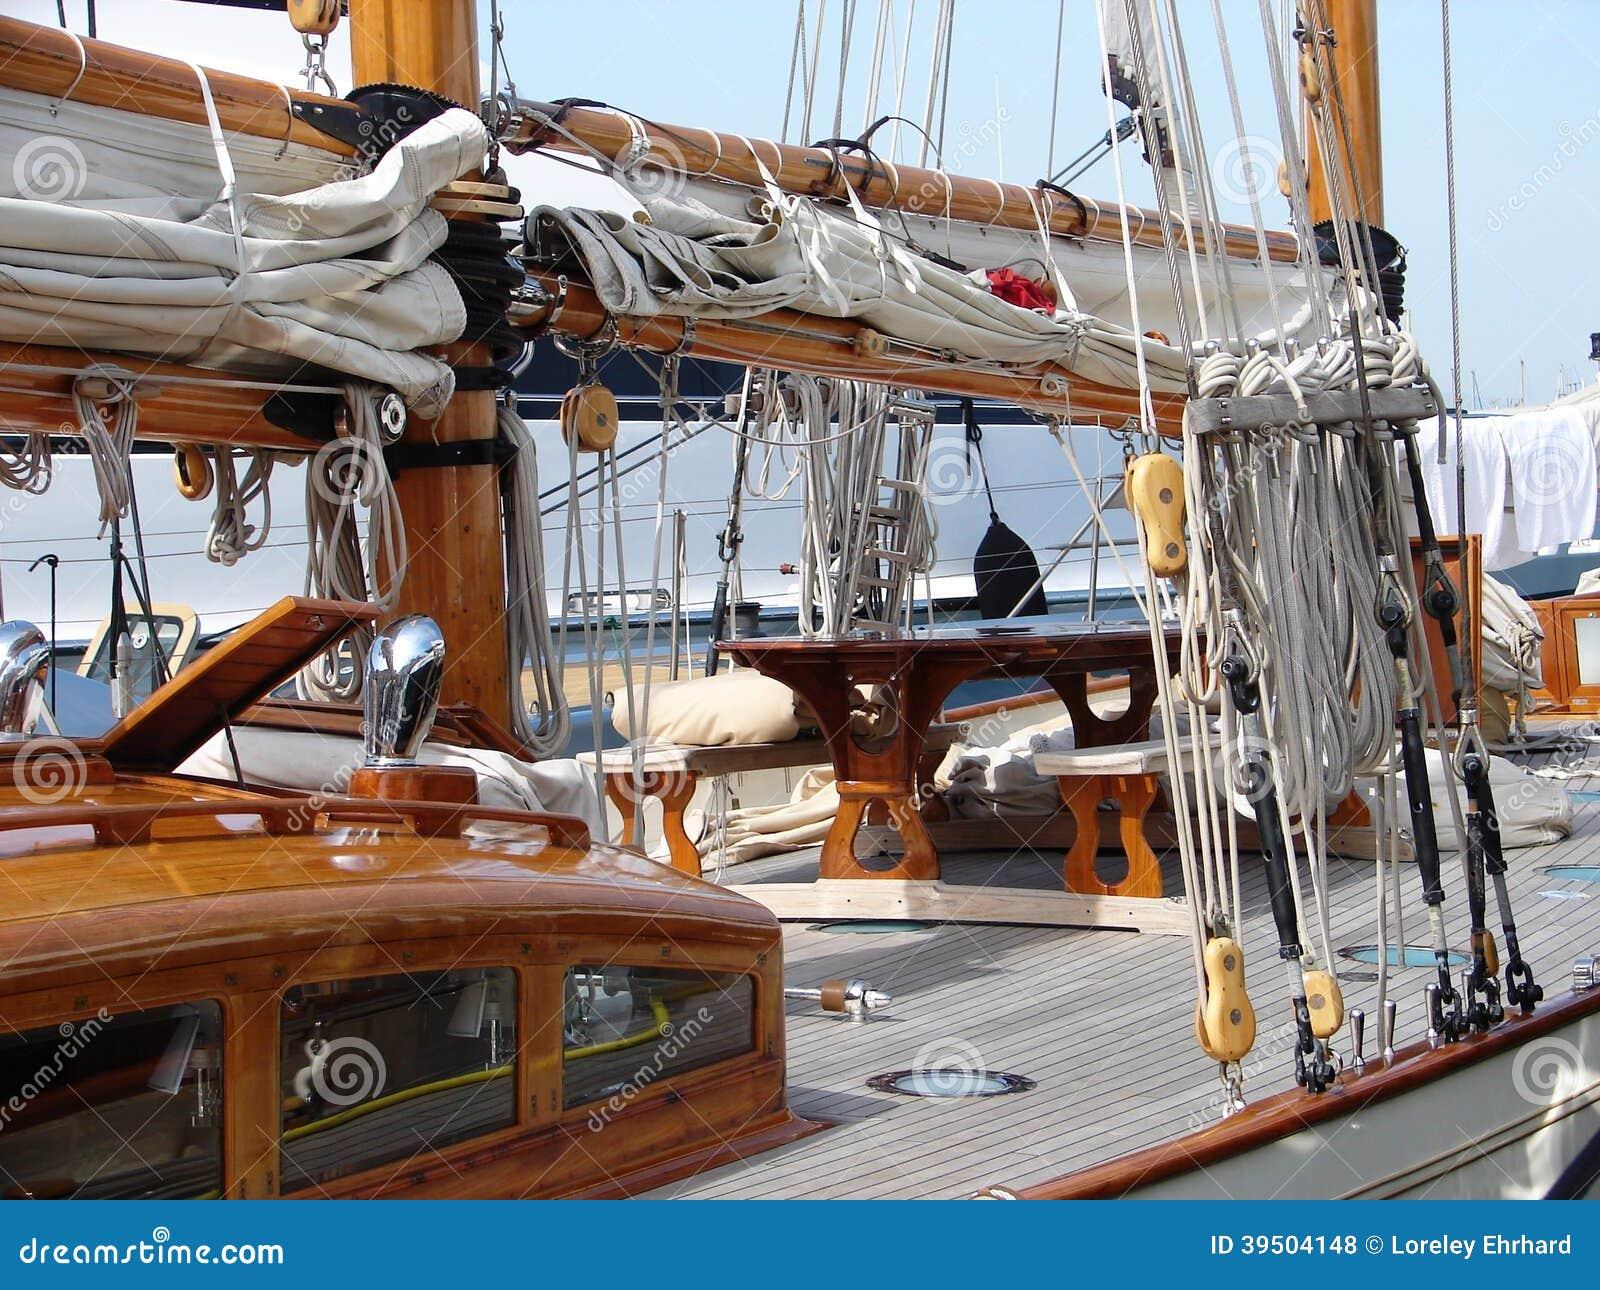 Sailboat at rest.